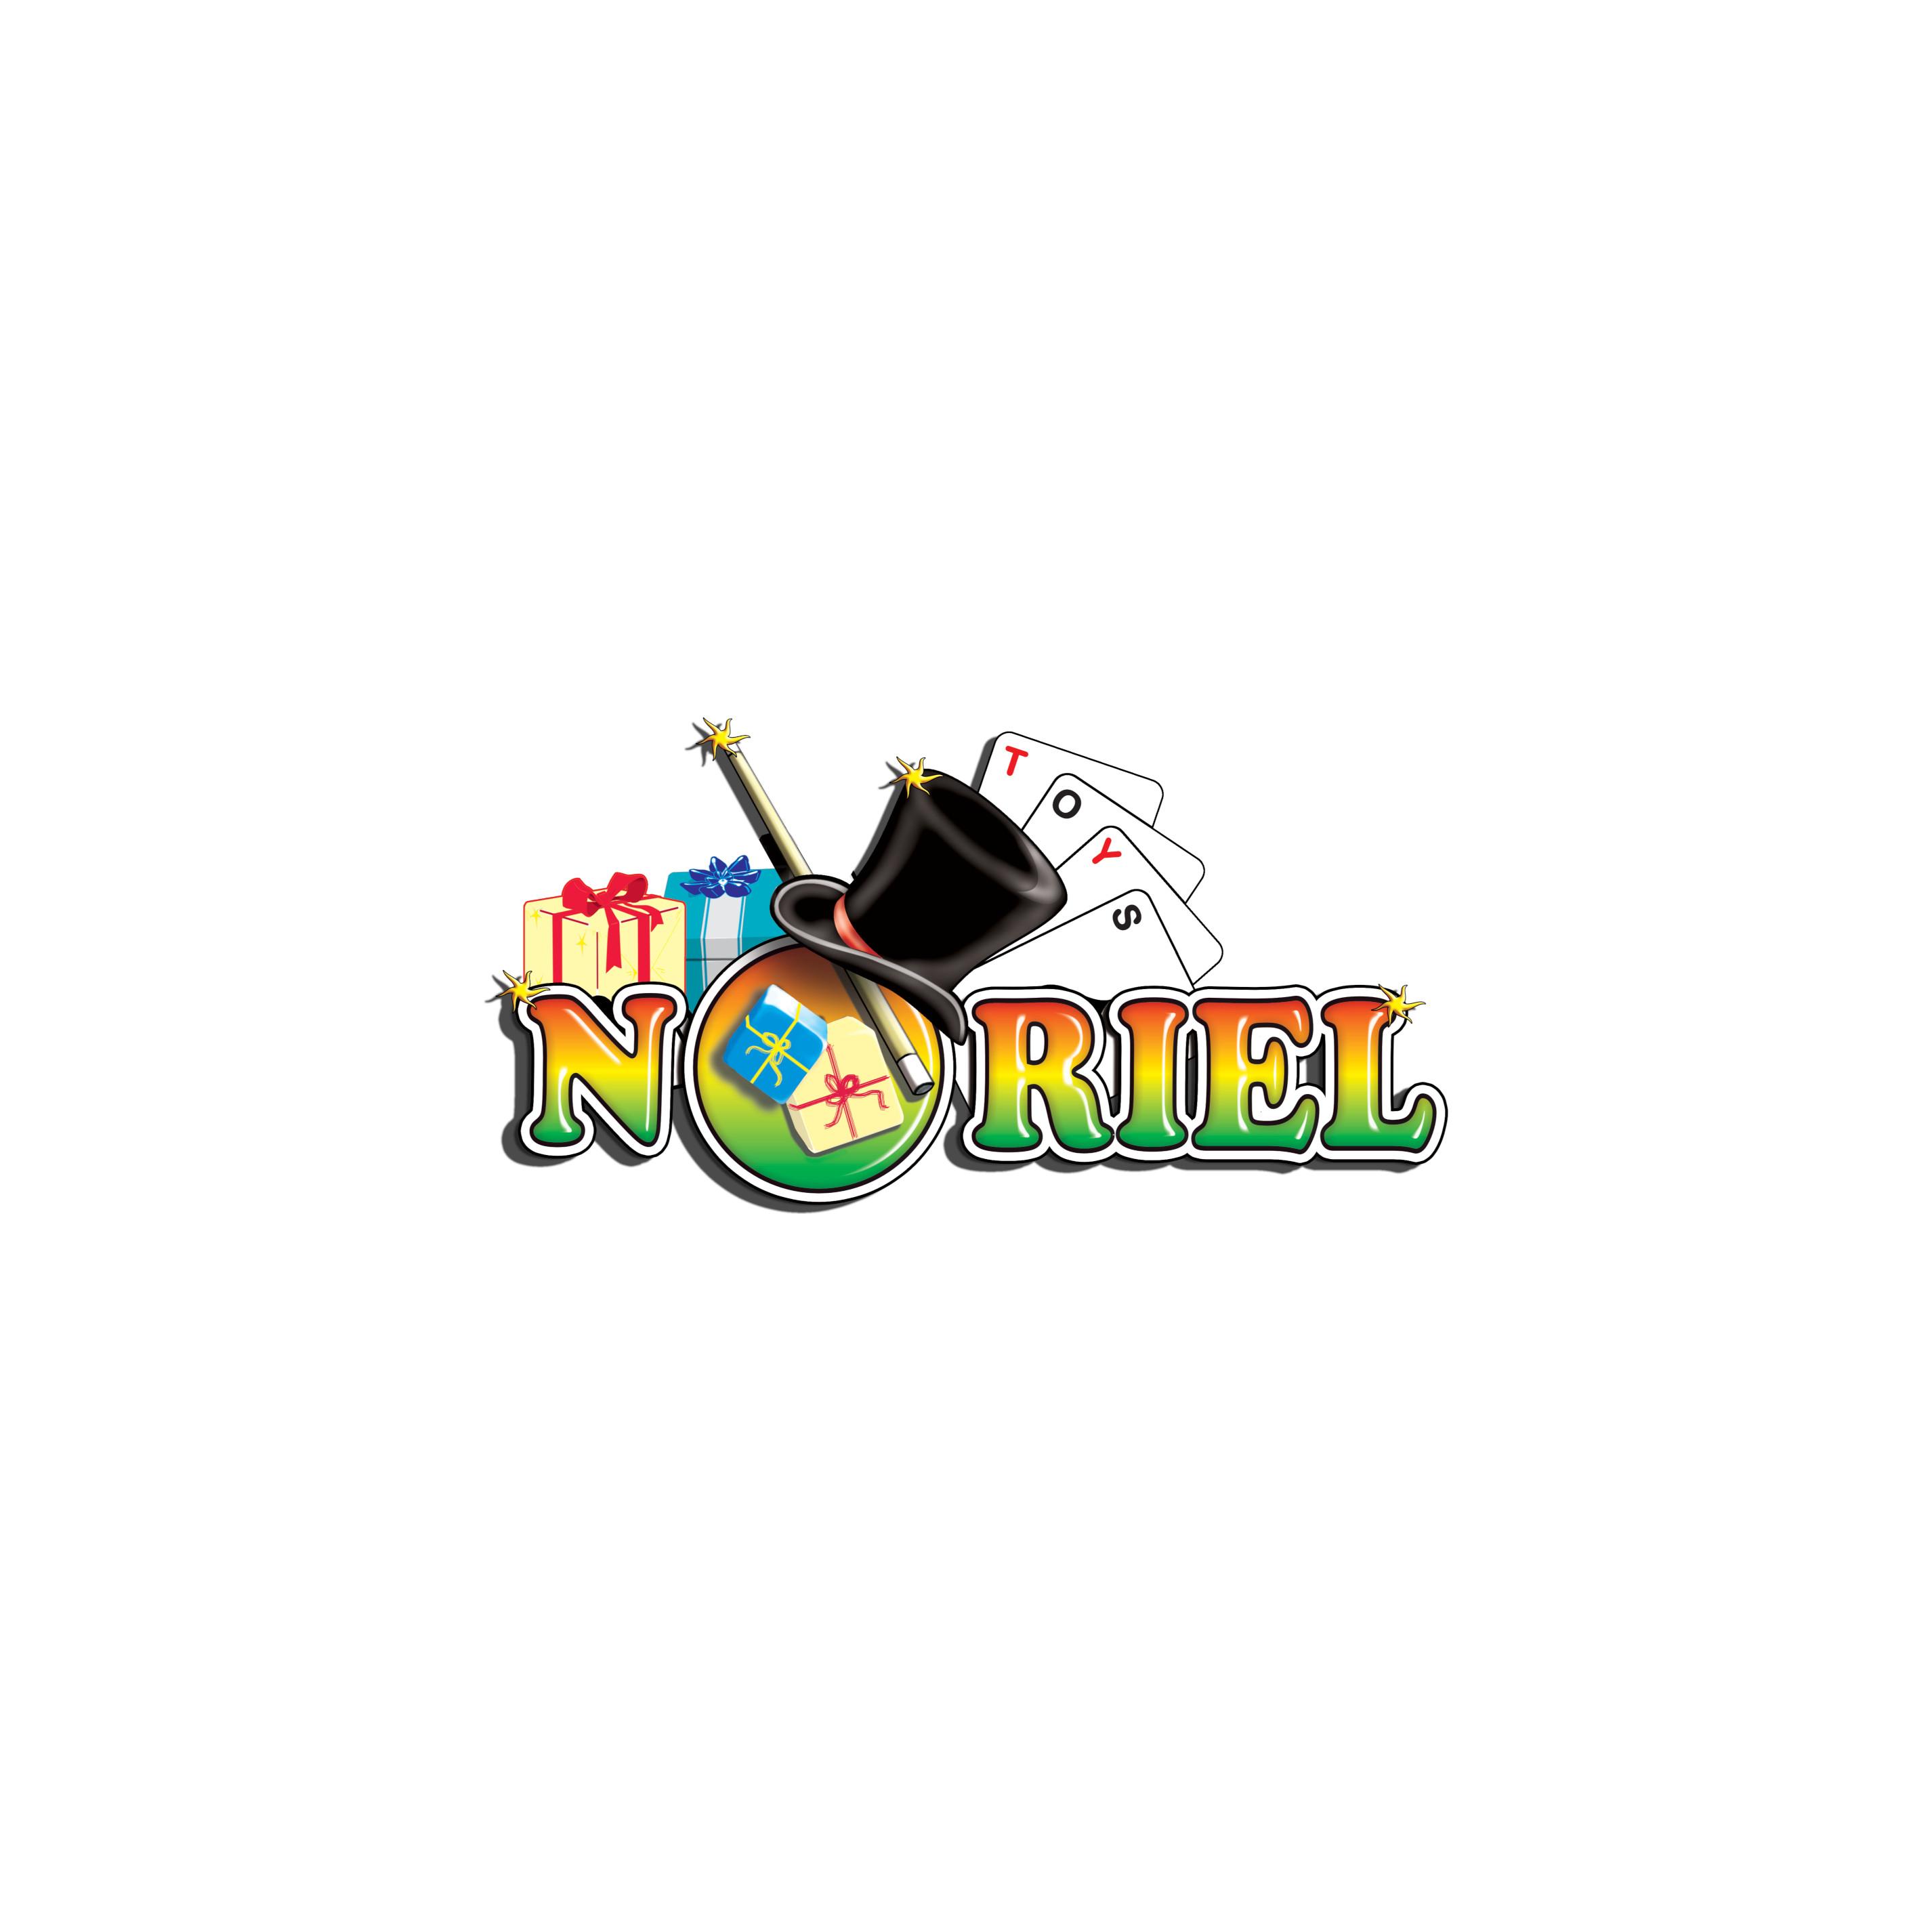 NOR4574_001w Puzzle educativ Noriel - Harta Romaniei, 150 piese